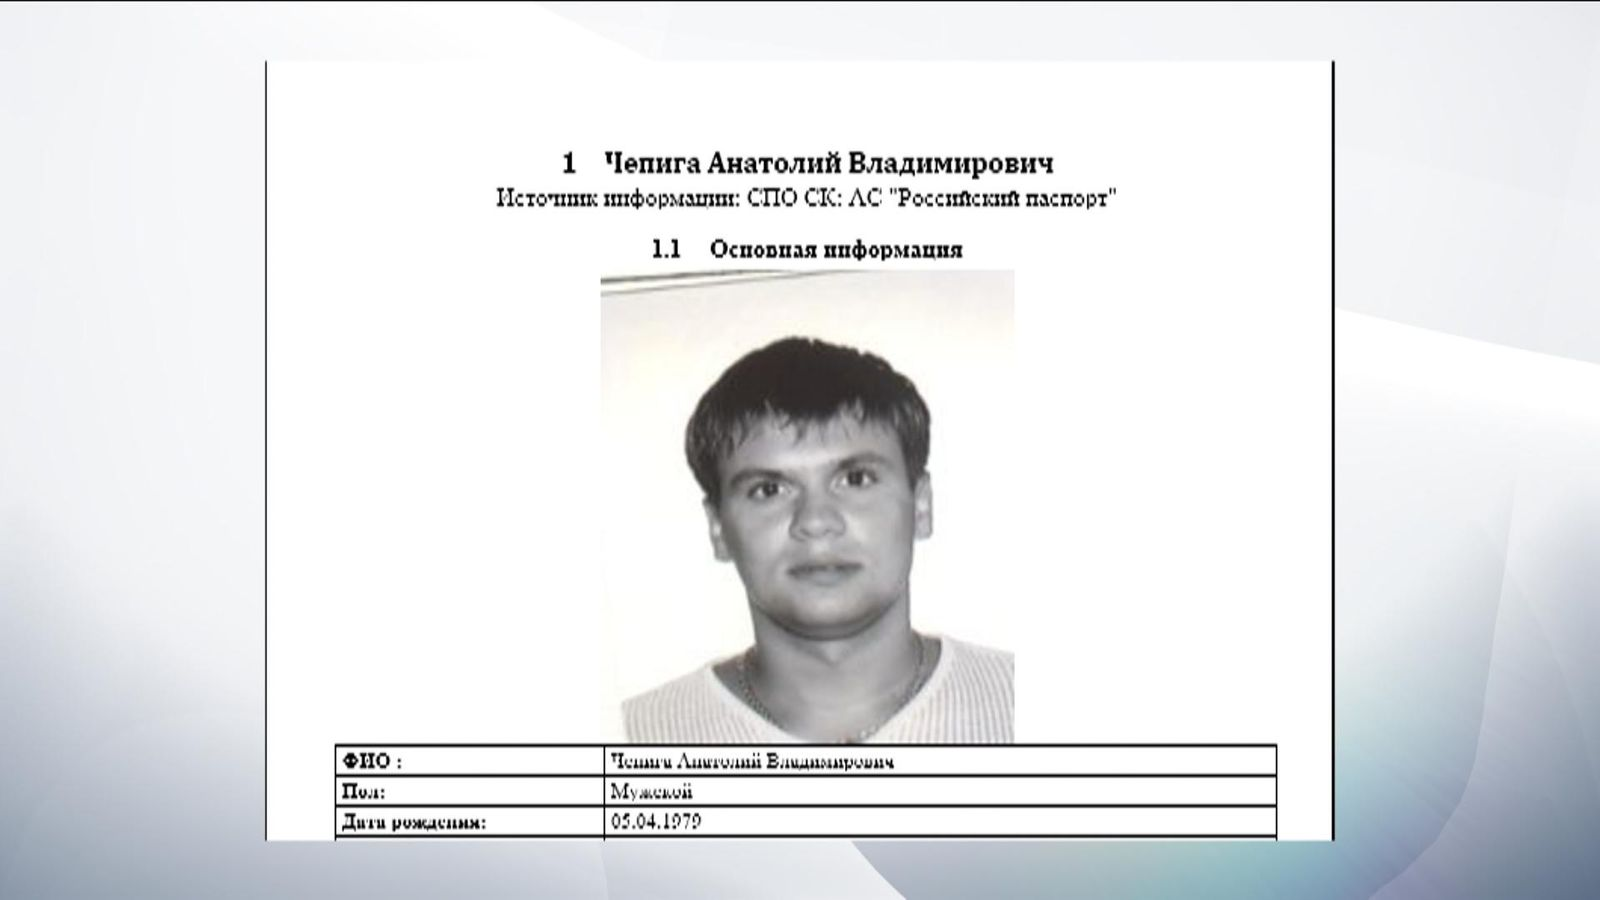 Petrov, Boshirov, Colonel Chepiga. And who do you actually believe 26